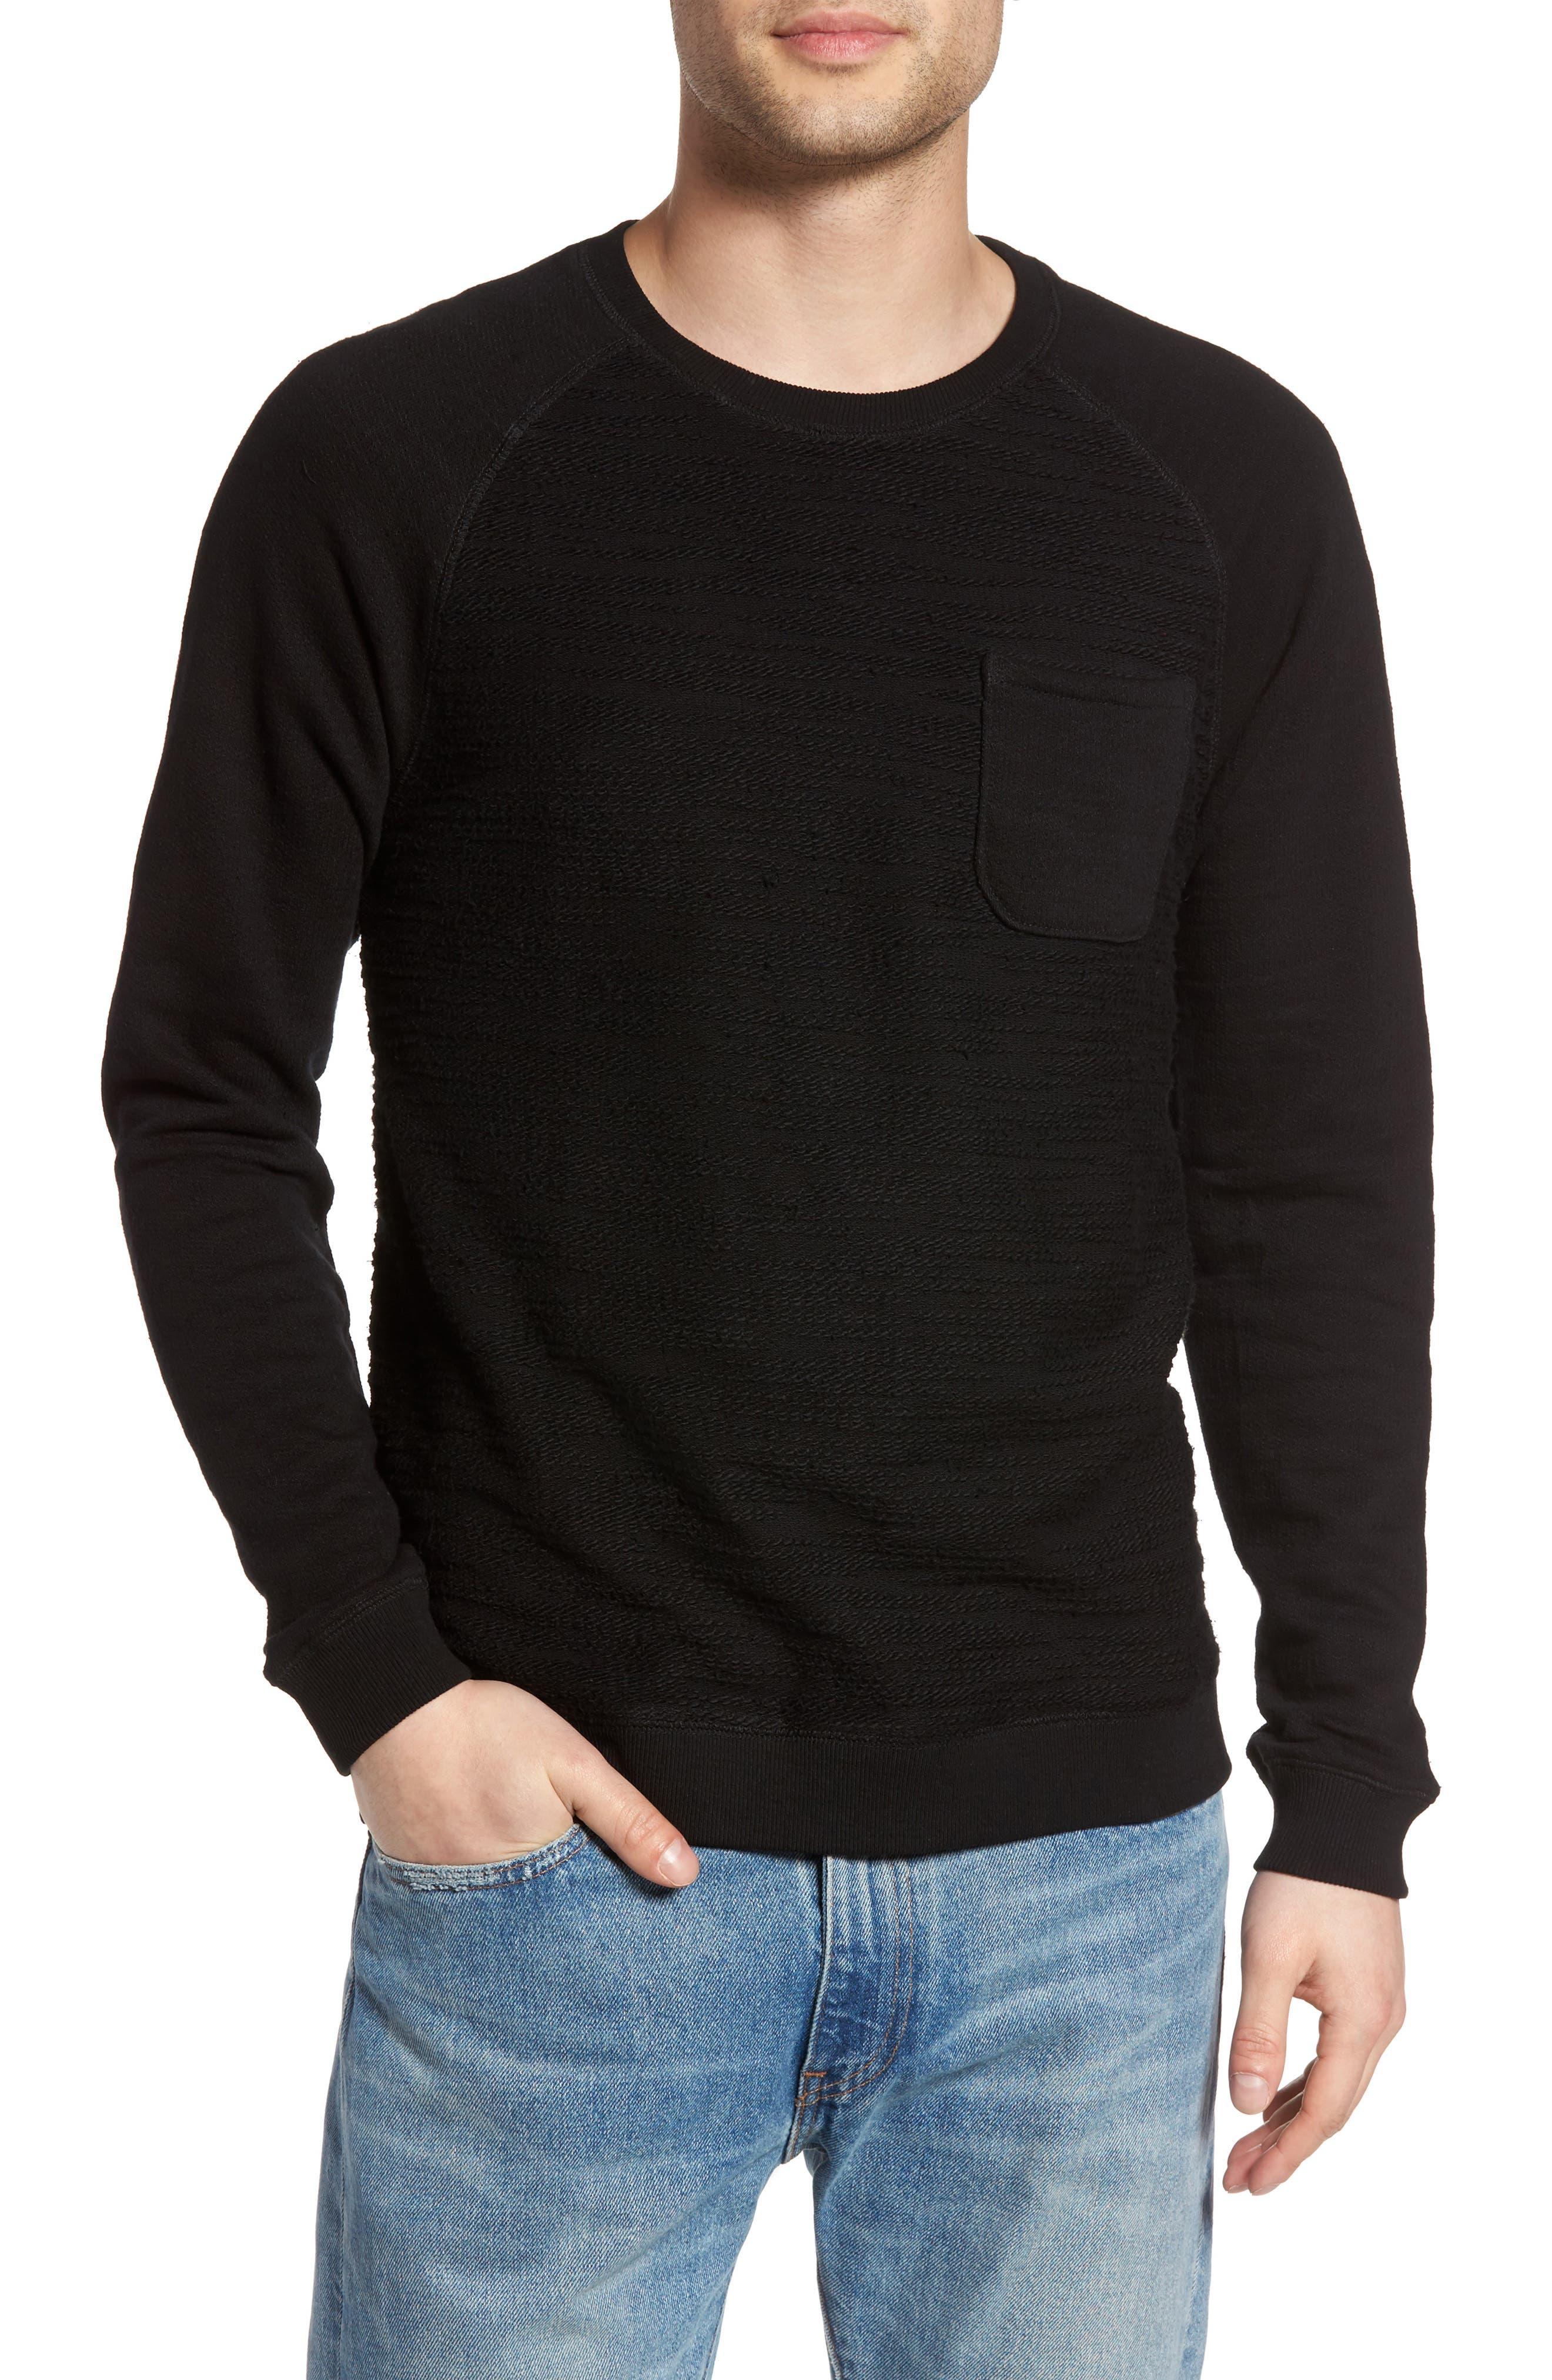 Z.A.K. Brand Frey Slubbed Pocket Sweatshirt